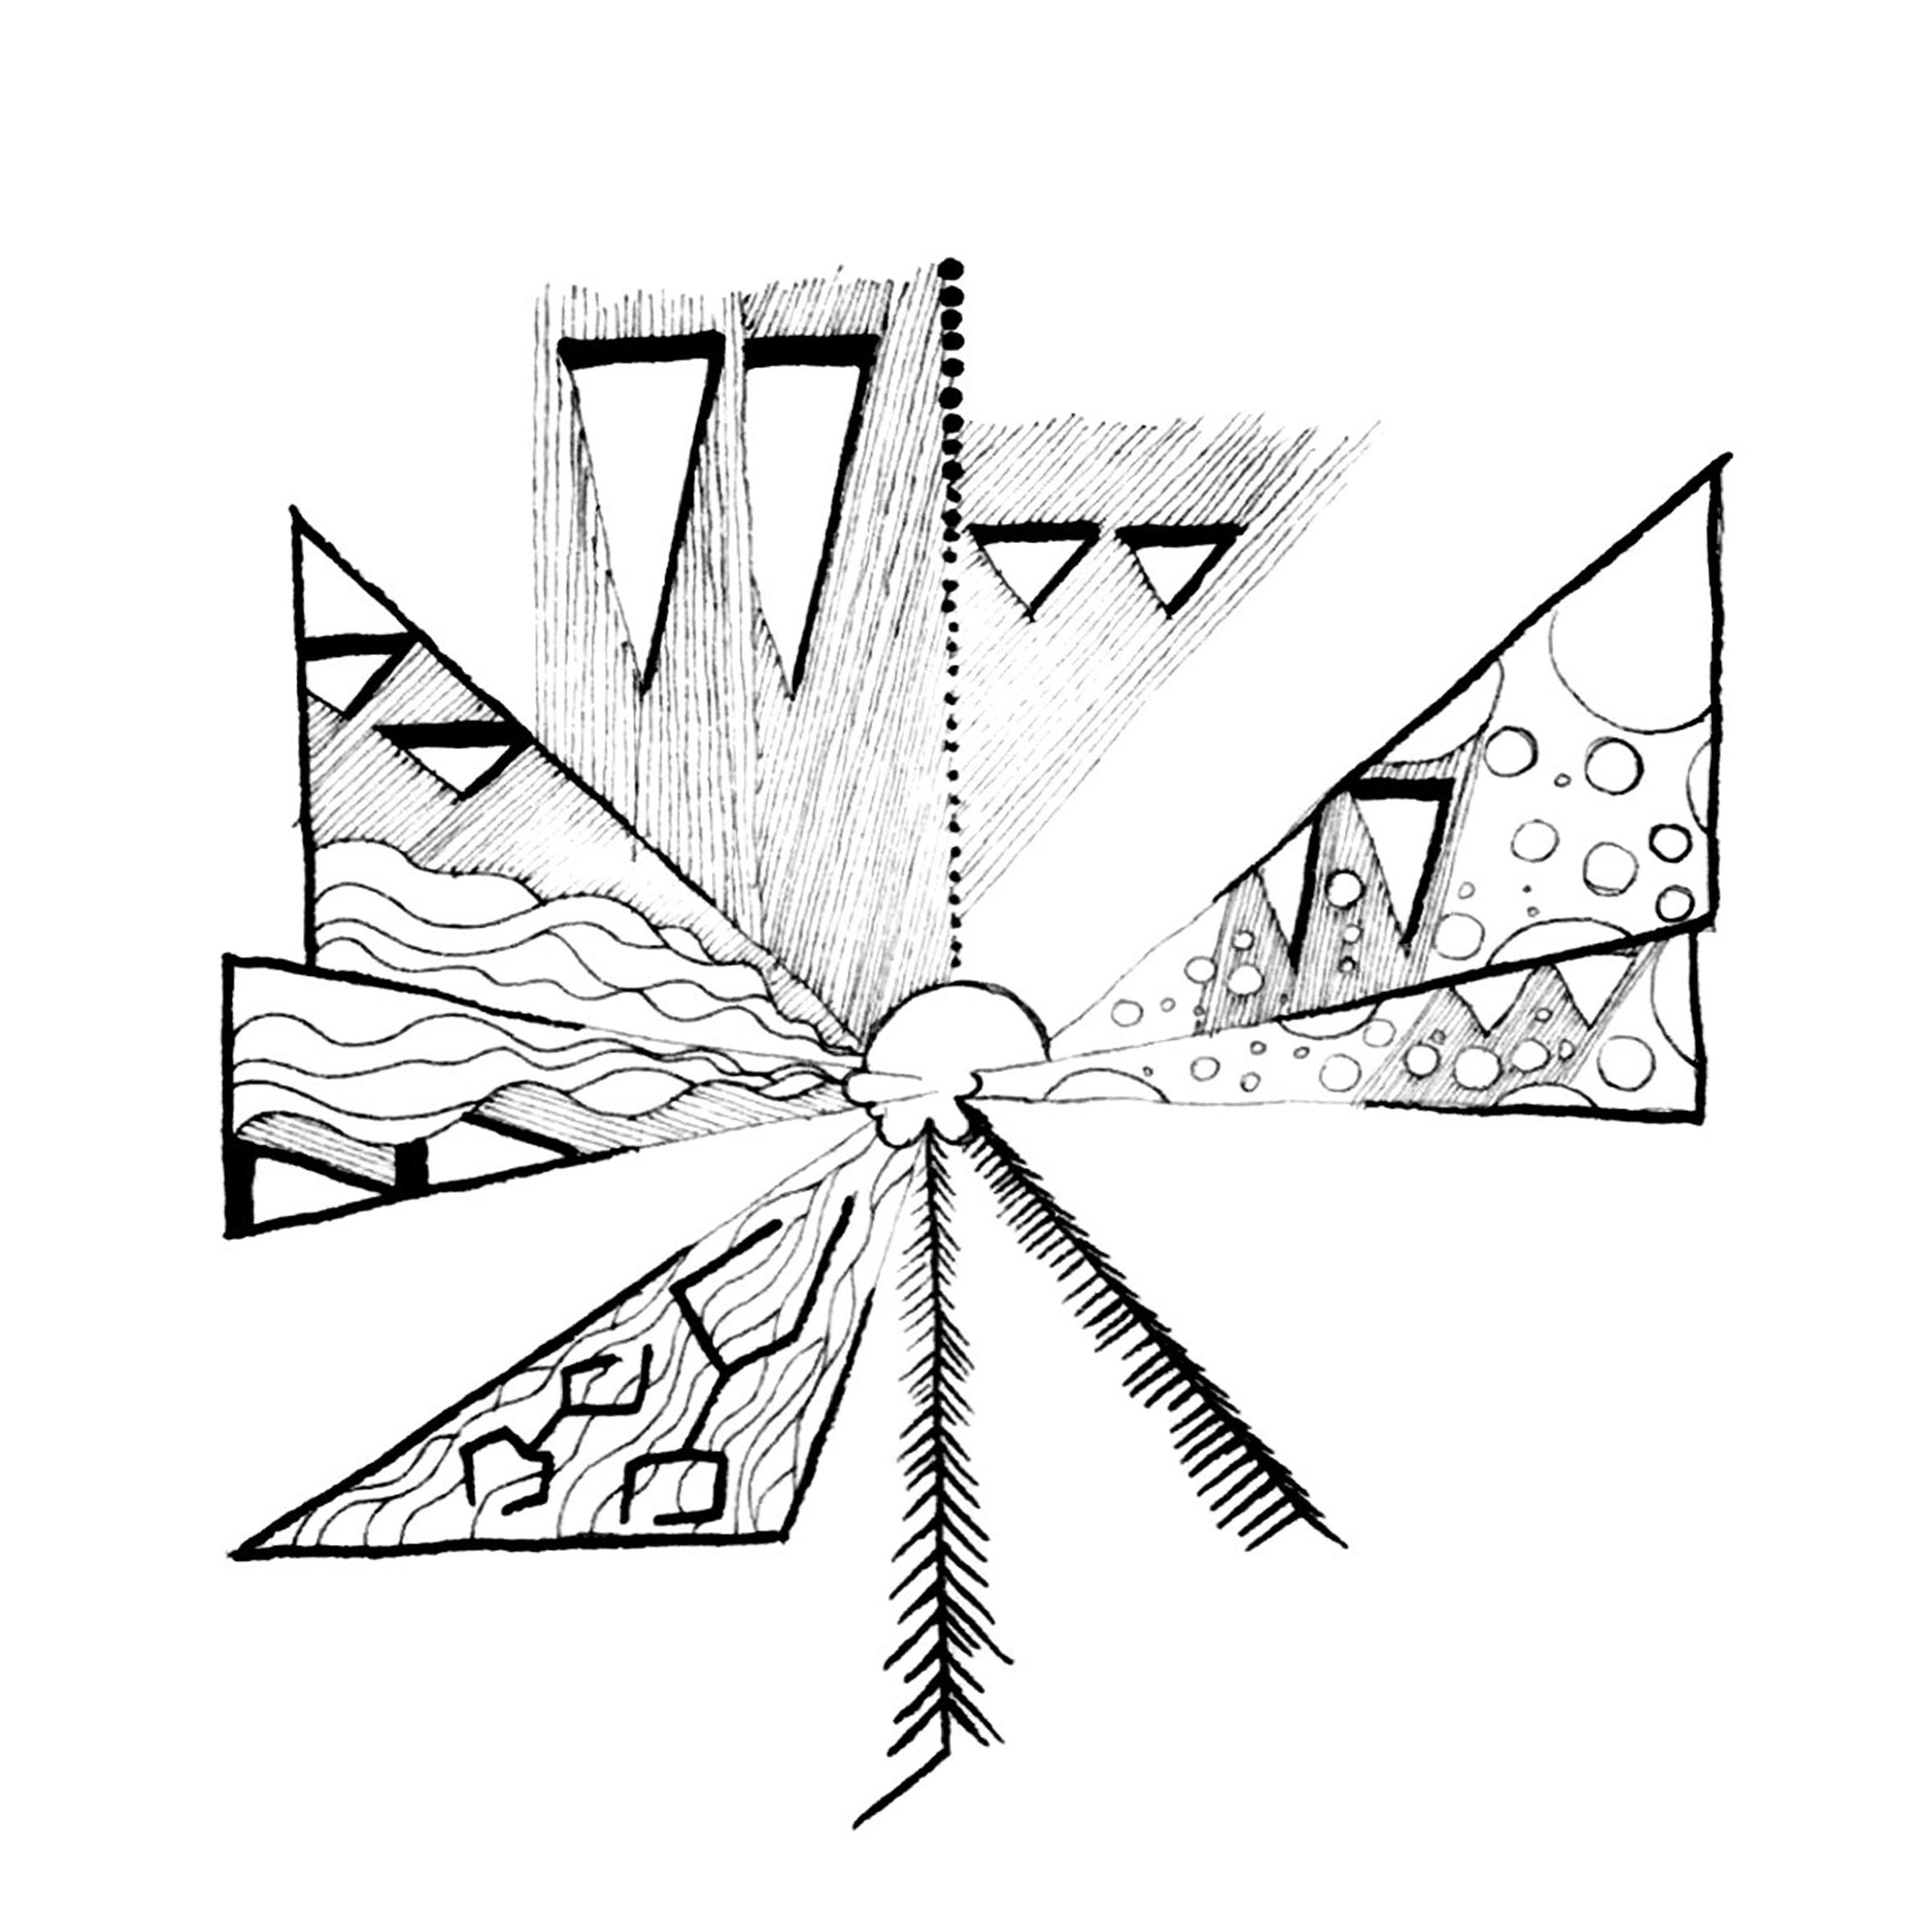 190326_+-ratio_illu_6.png